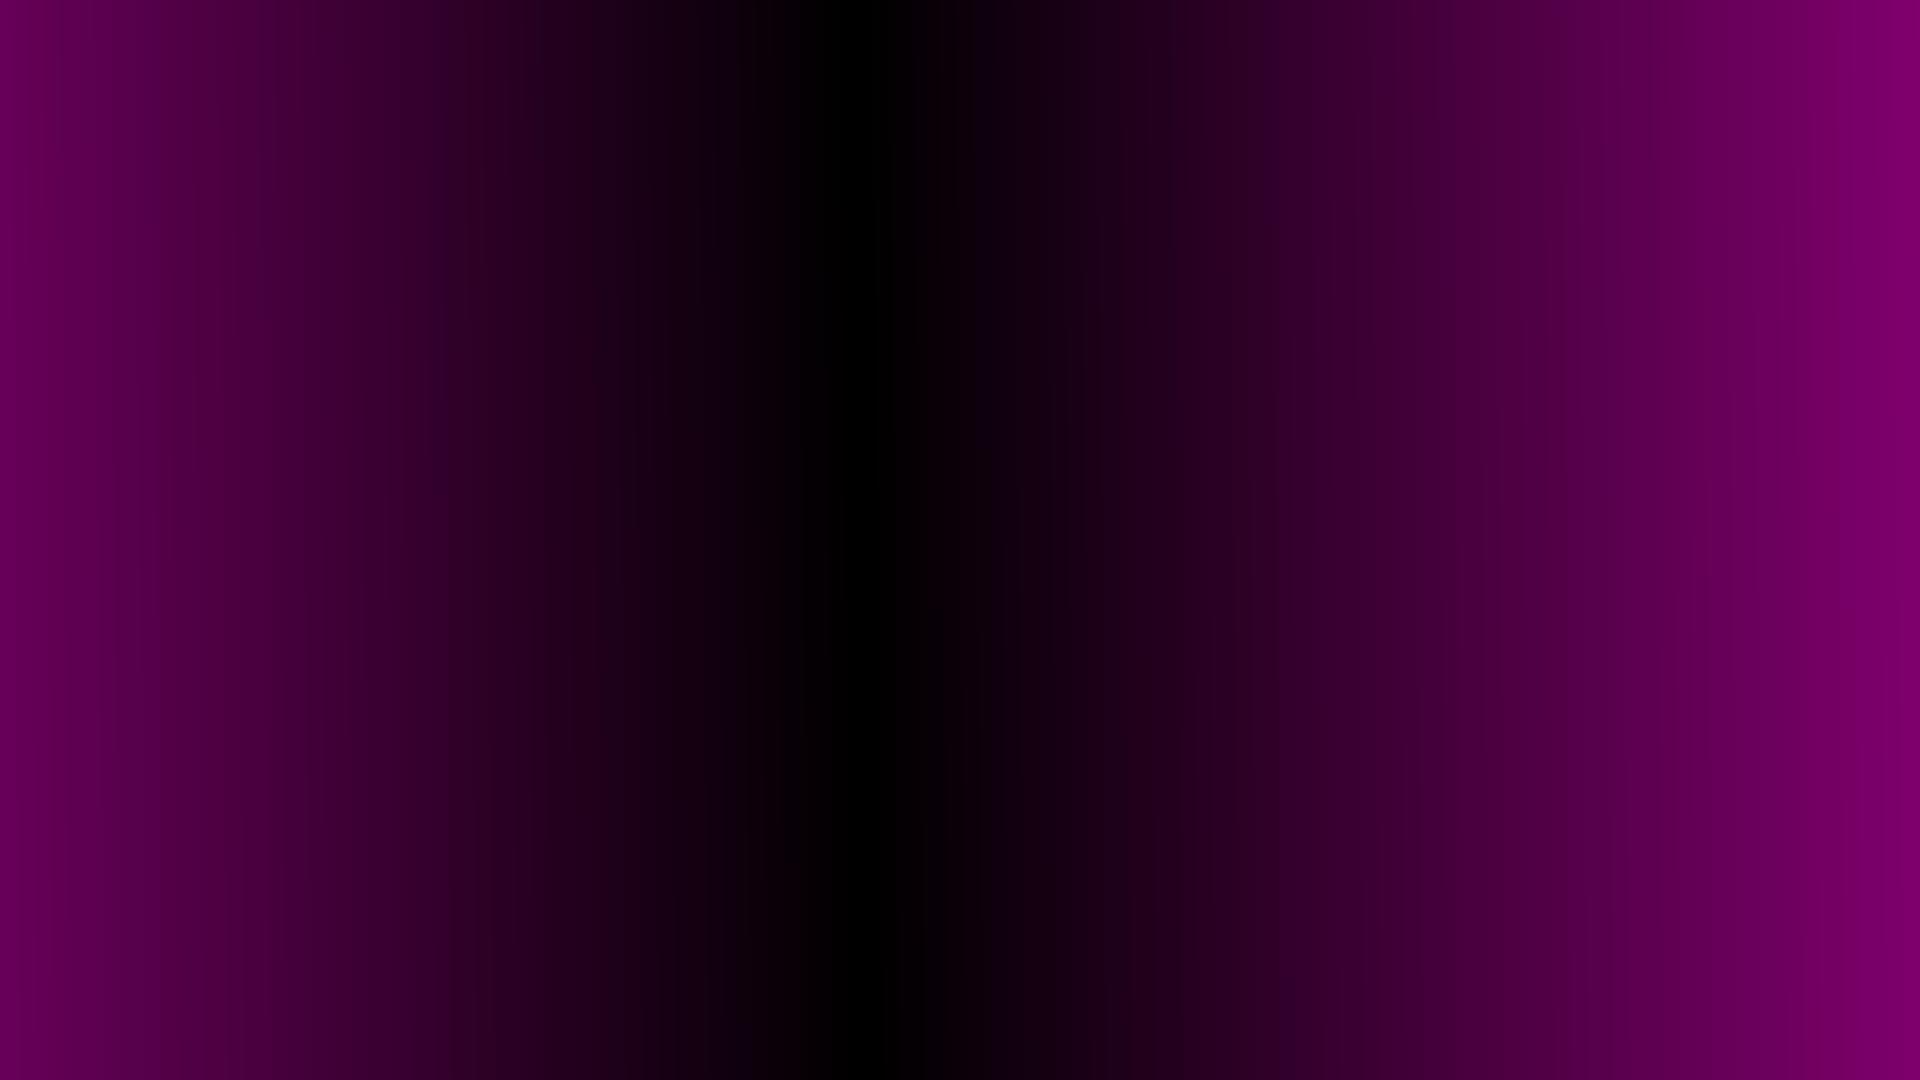 1920x1080 Dark Pink Black Gradient 1920x1080